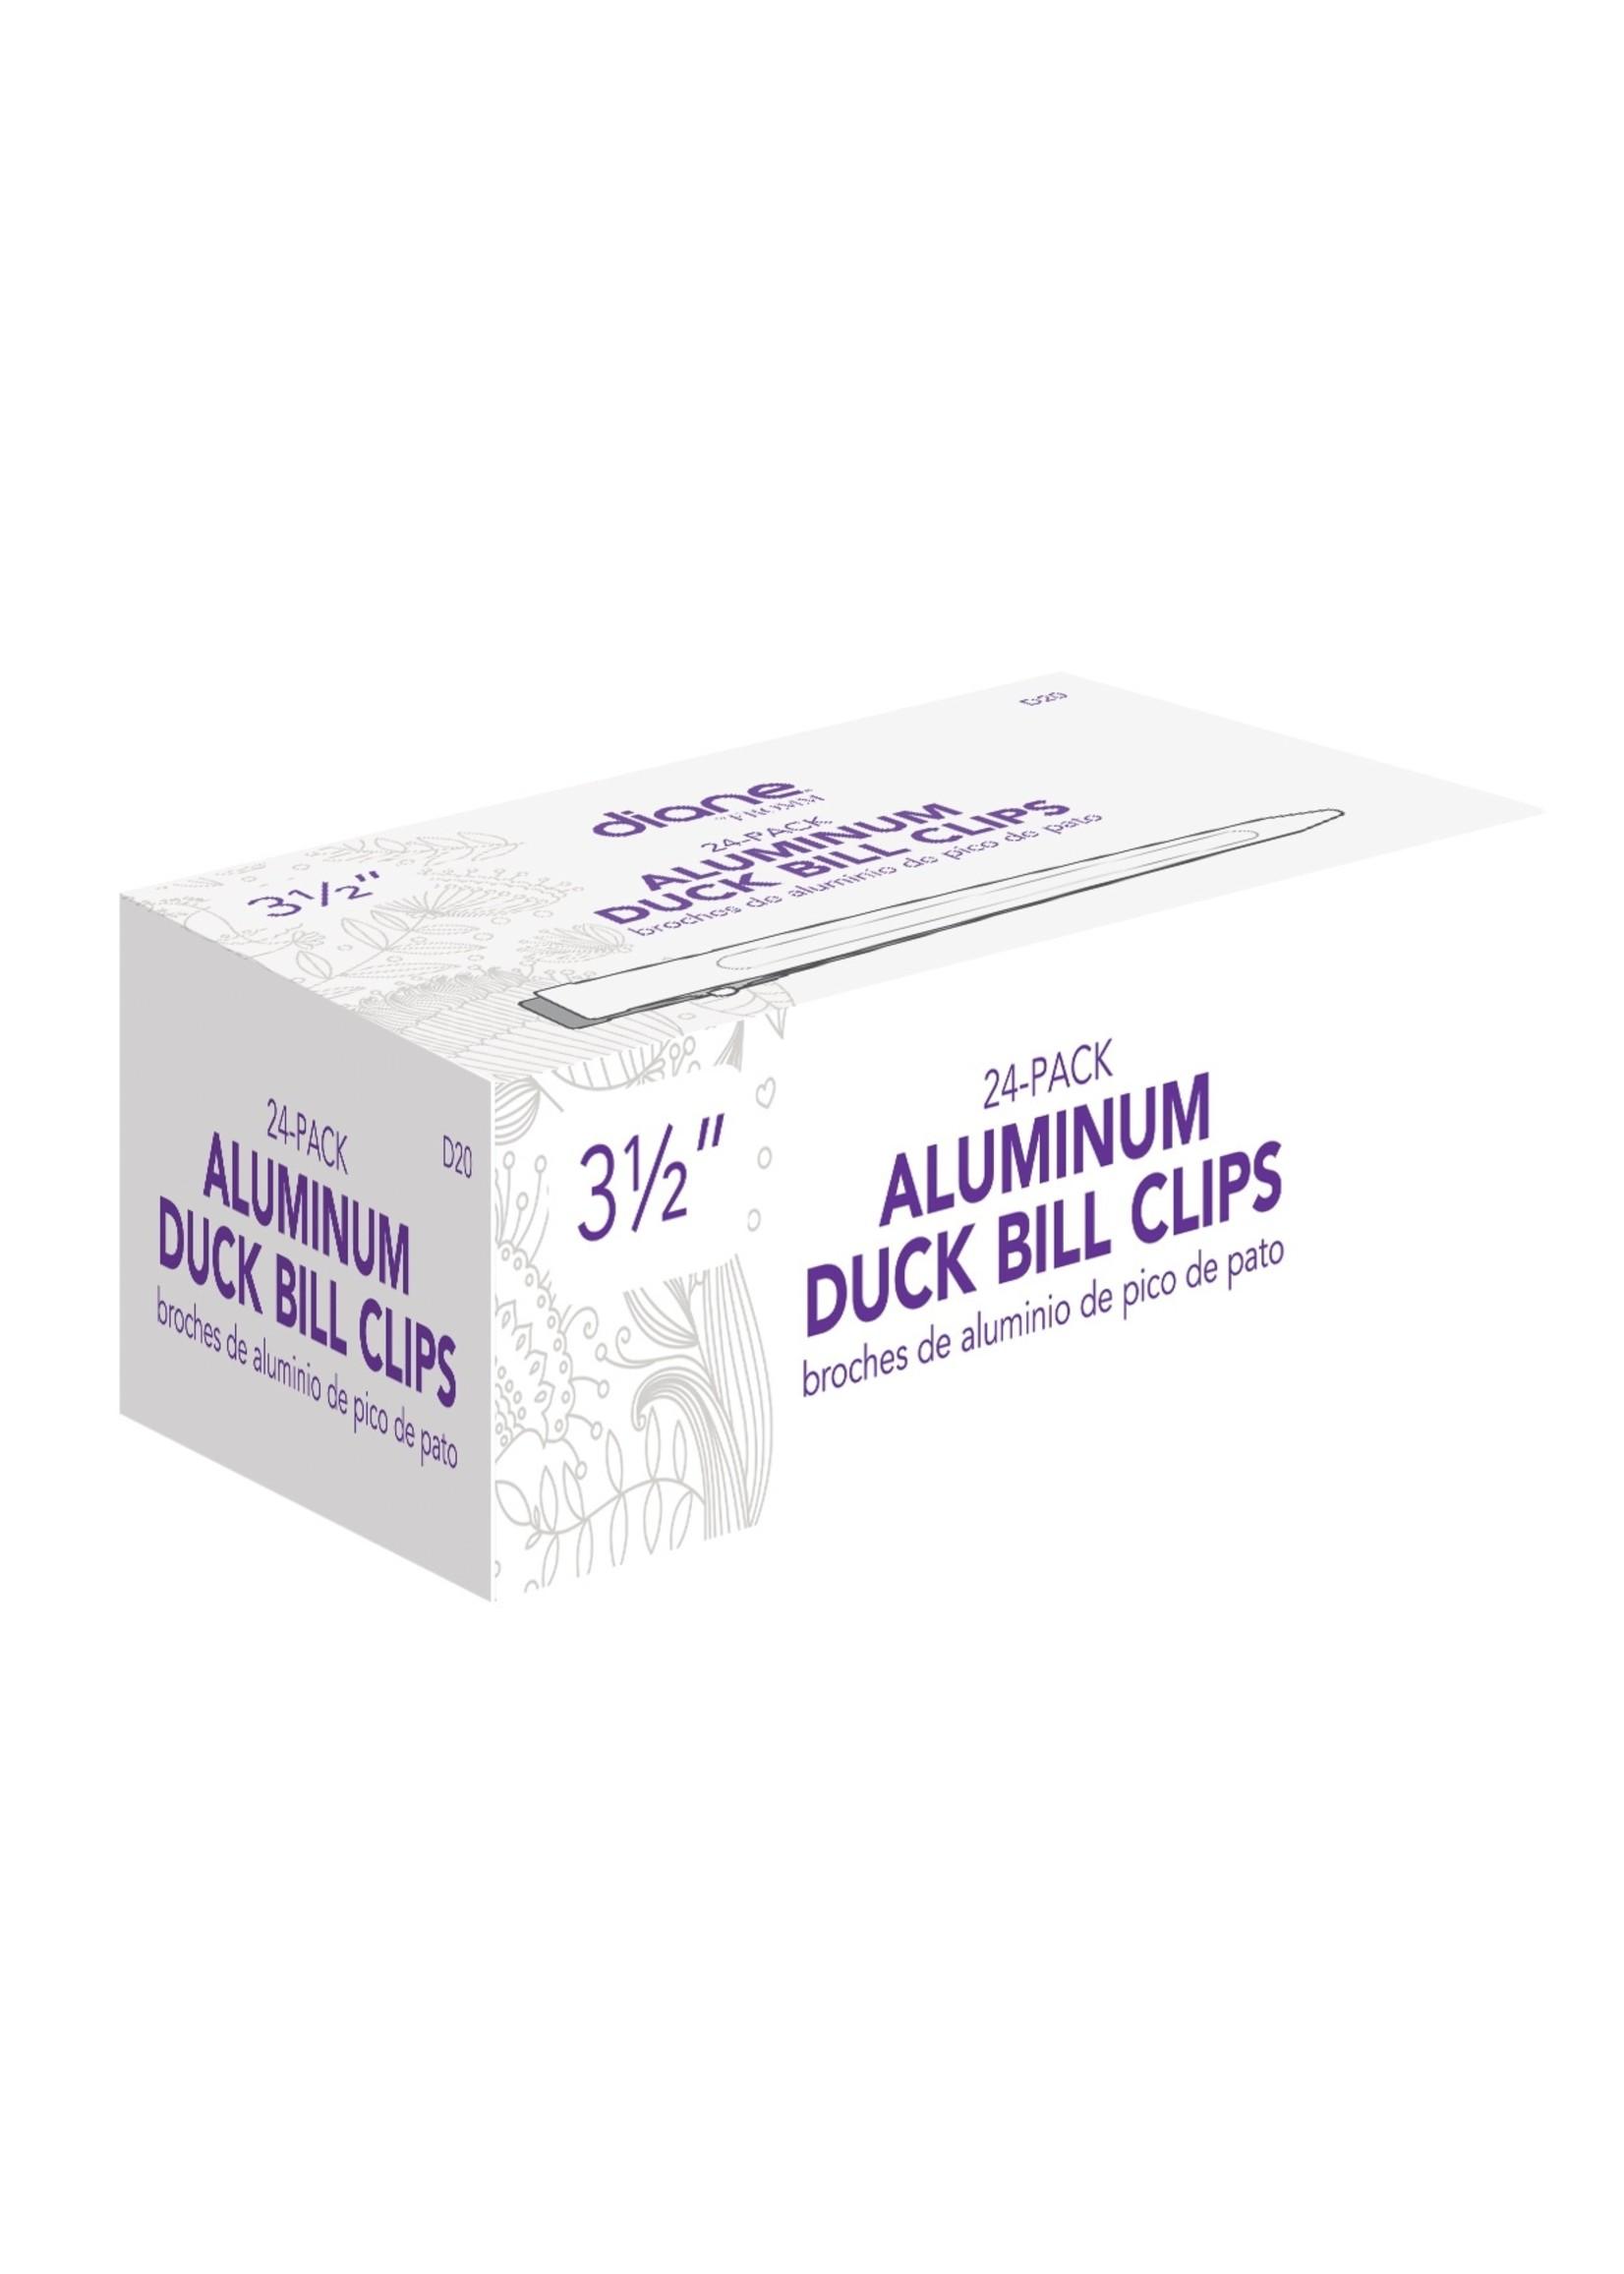 Duck Bill Clips -24pk